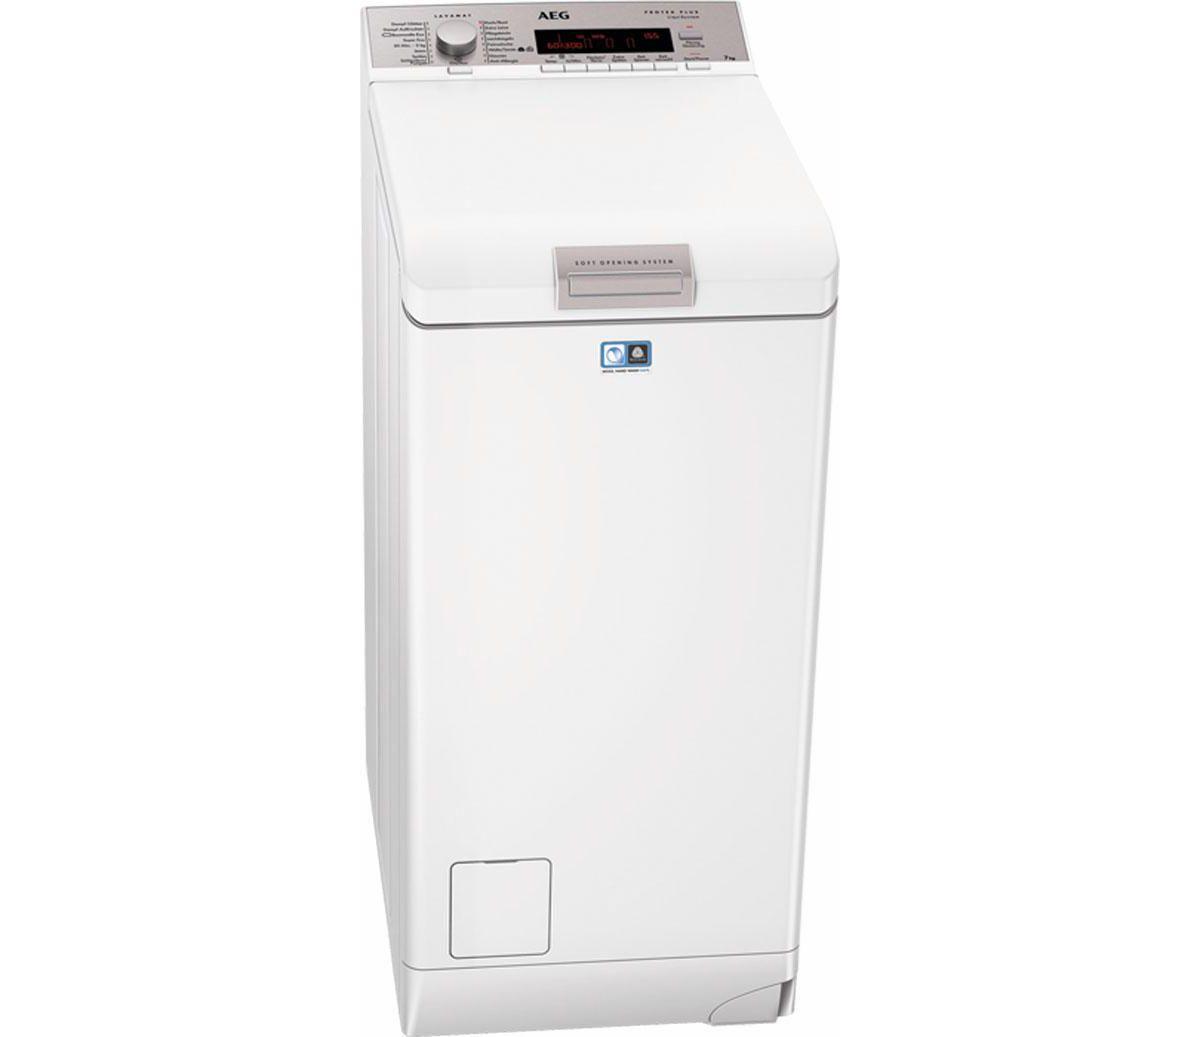 AEG Waschmaschine Toplader LAVAMAT L89375TL, A+...